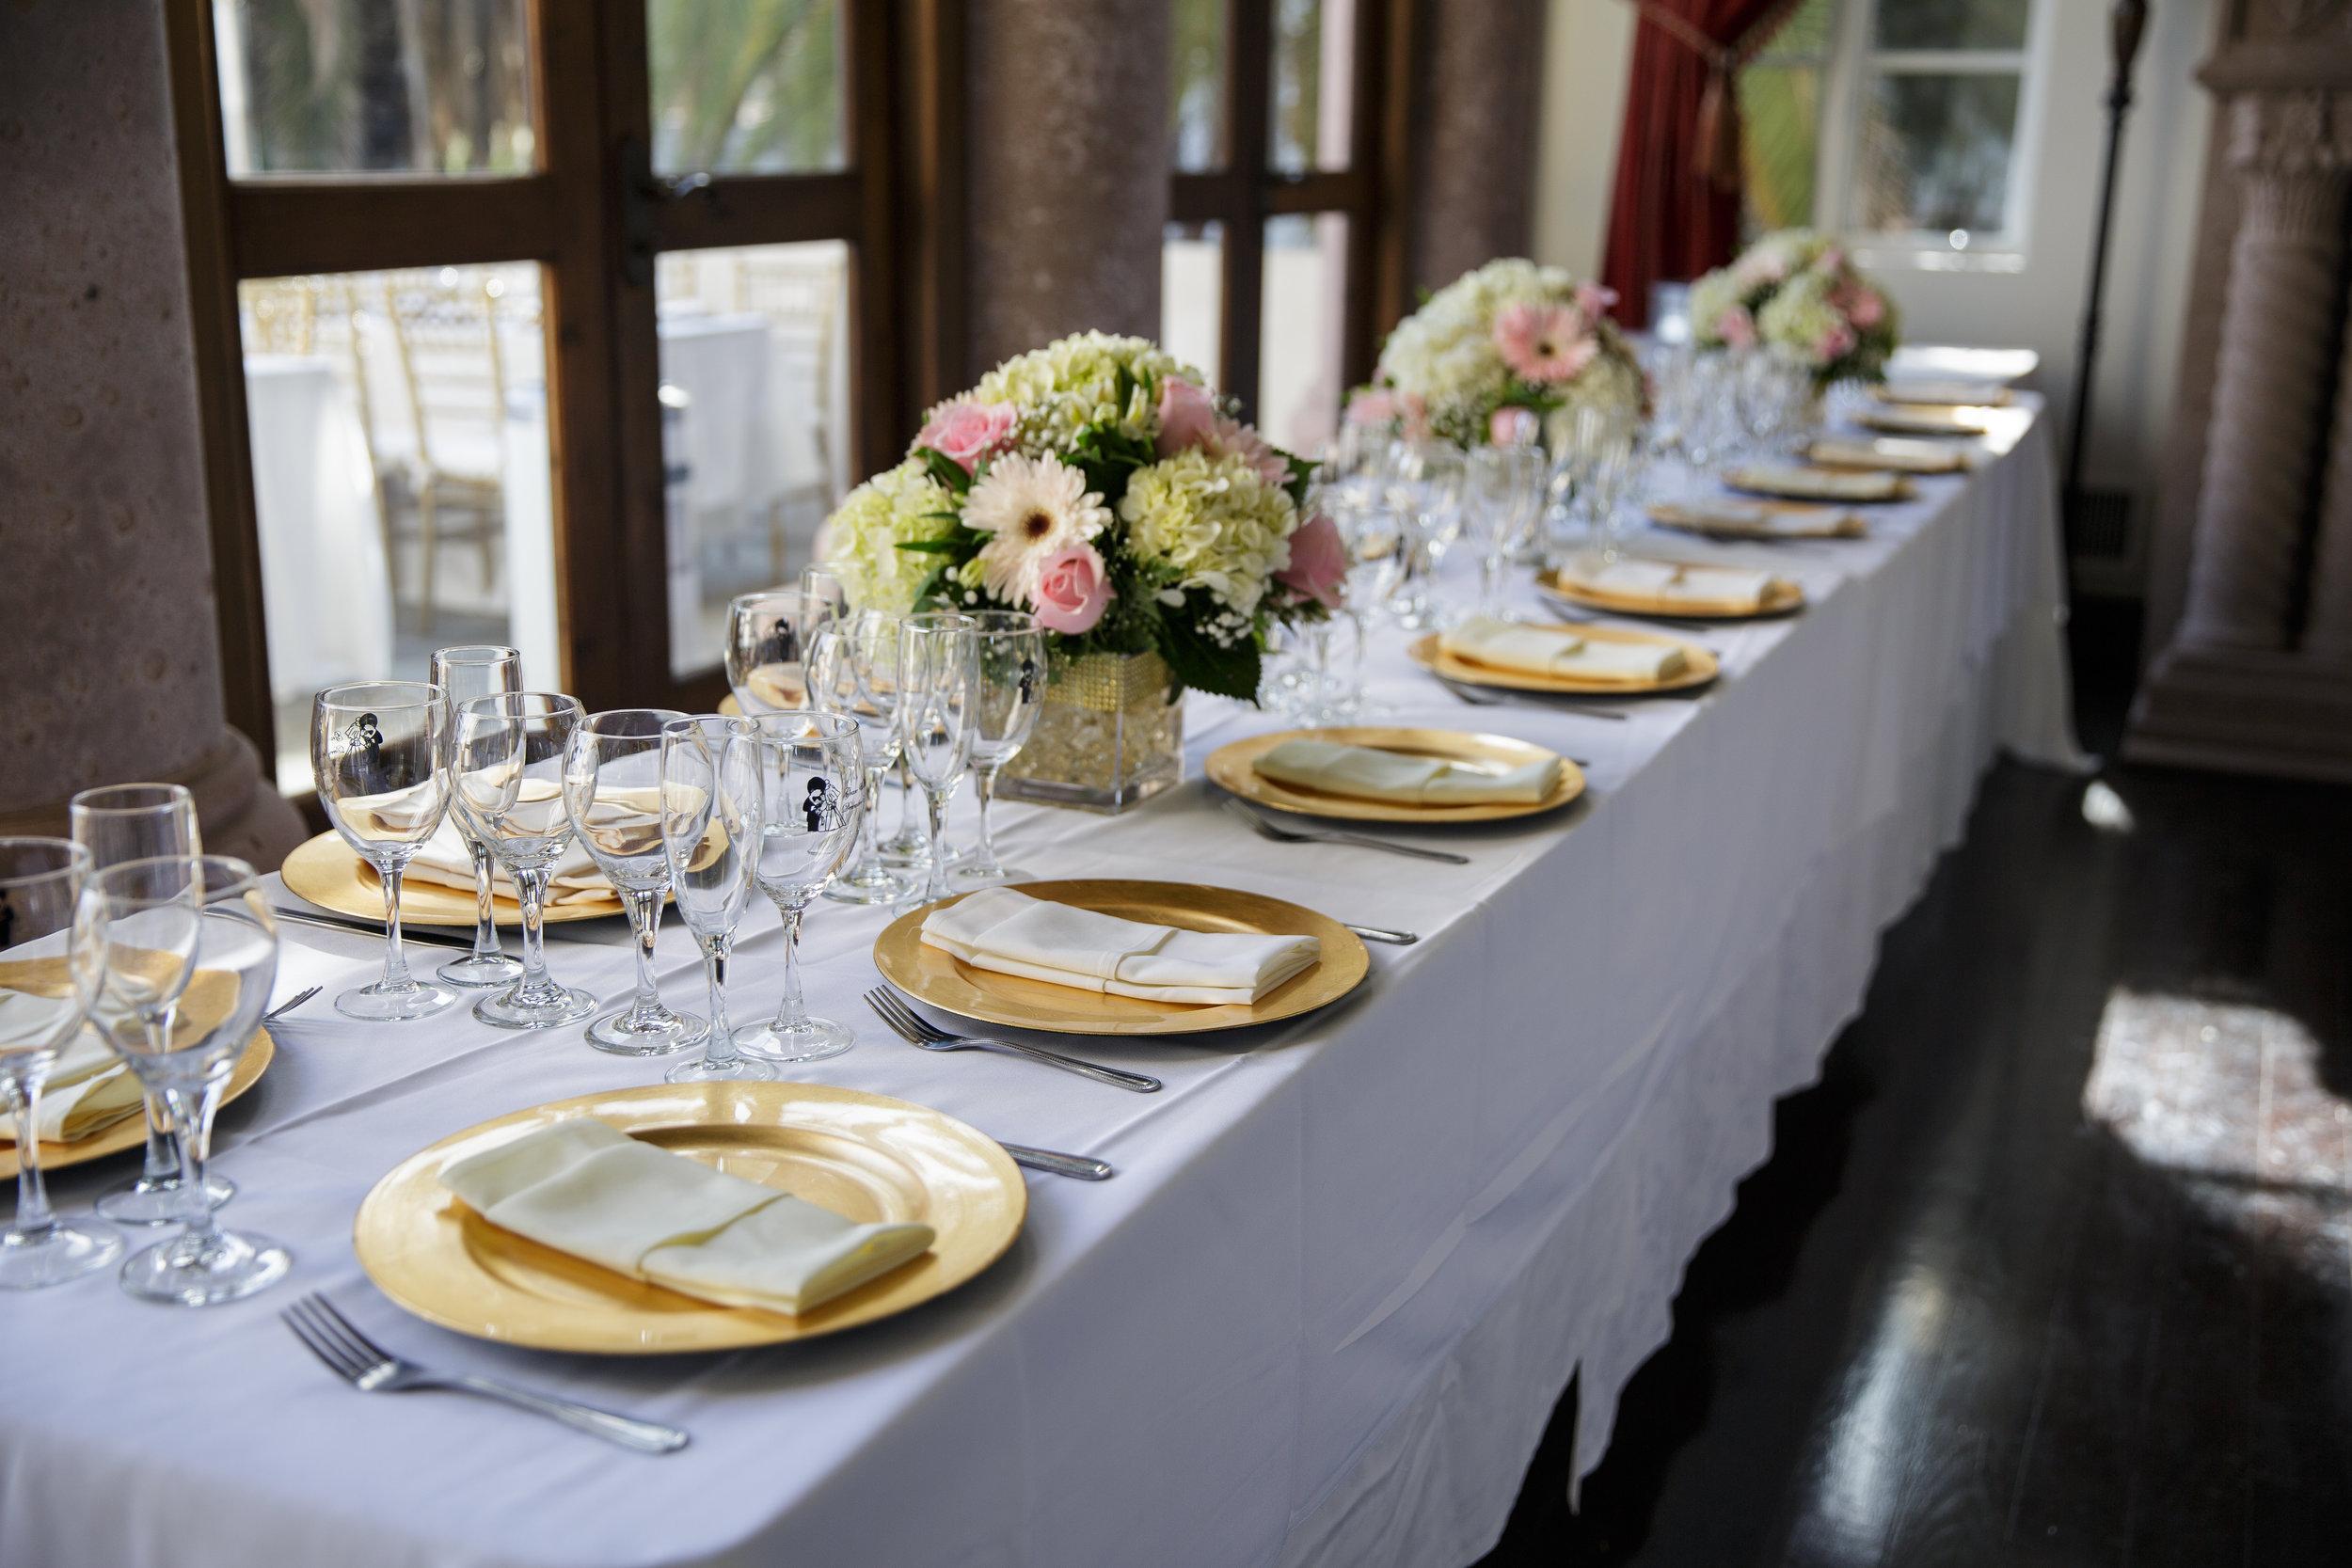 grace_mitchell_wedding-19.jpg